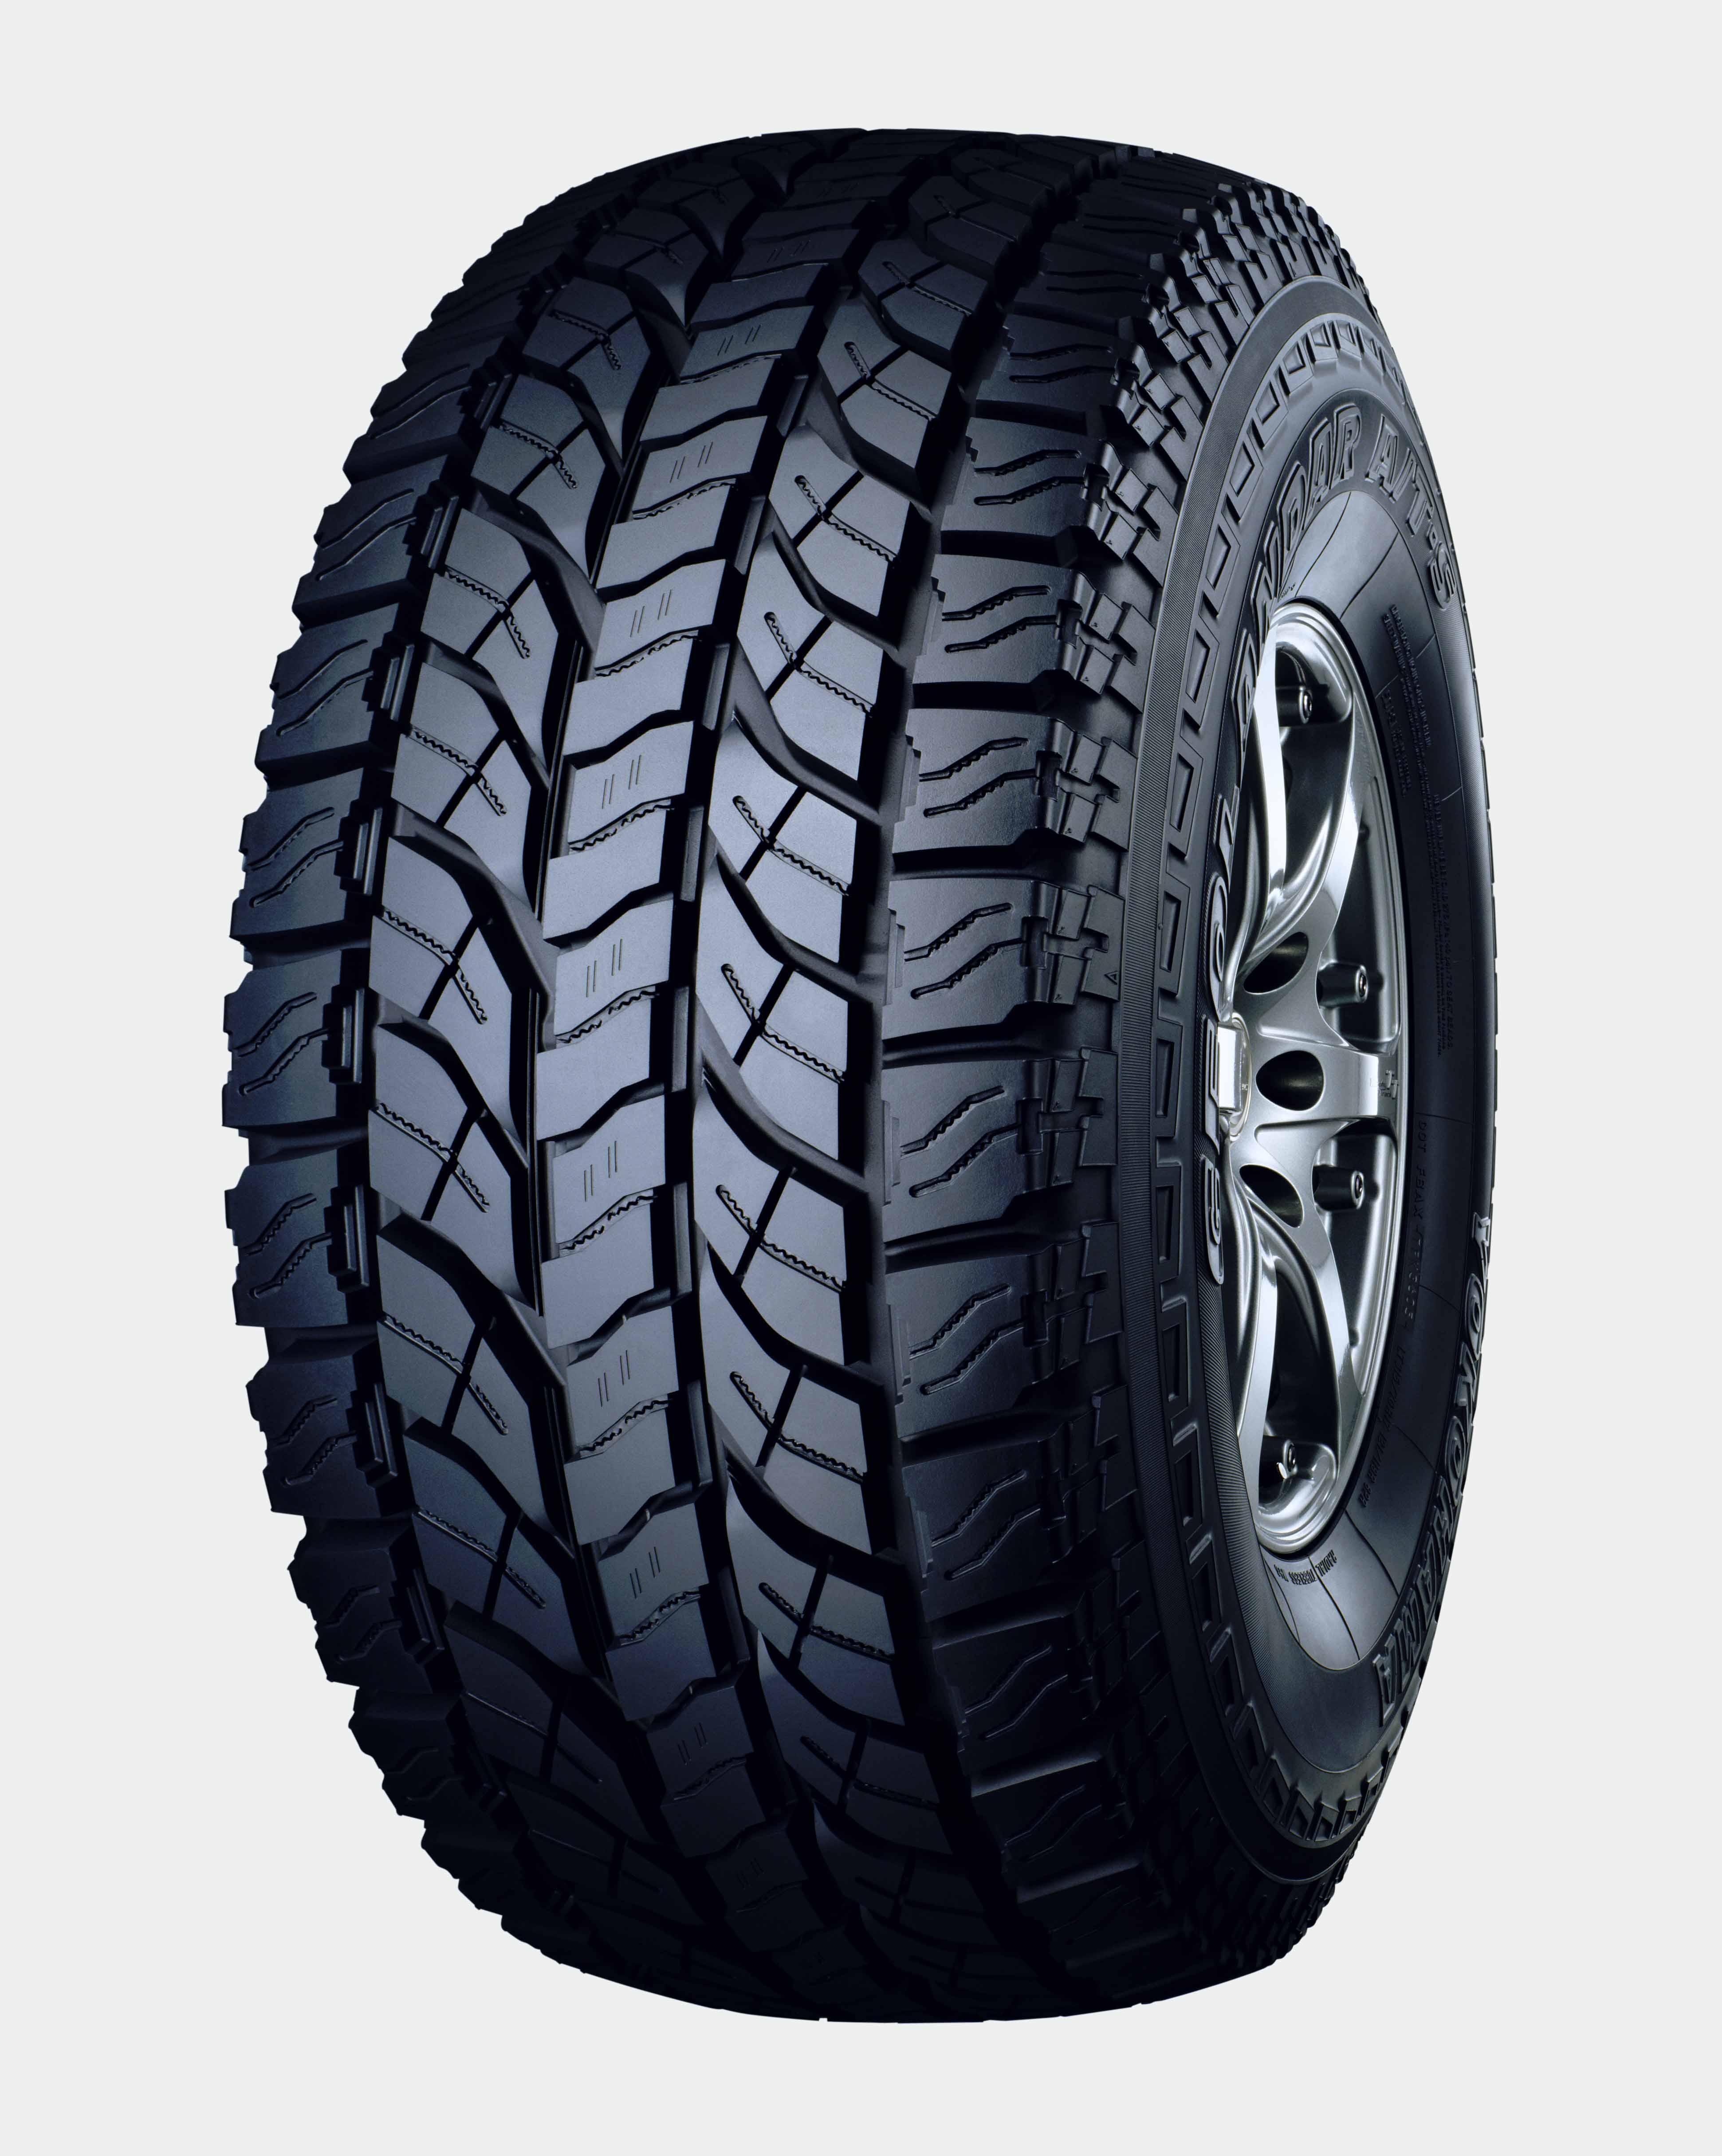 Yokohama Tires Tires Easy Com